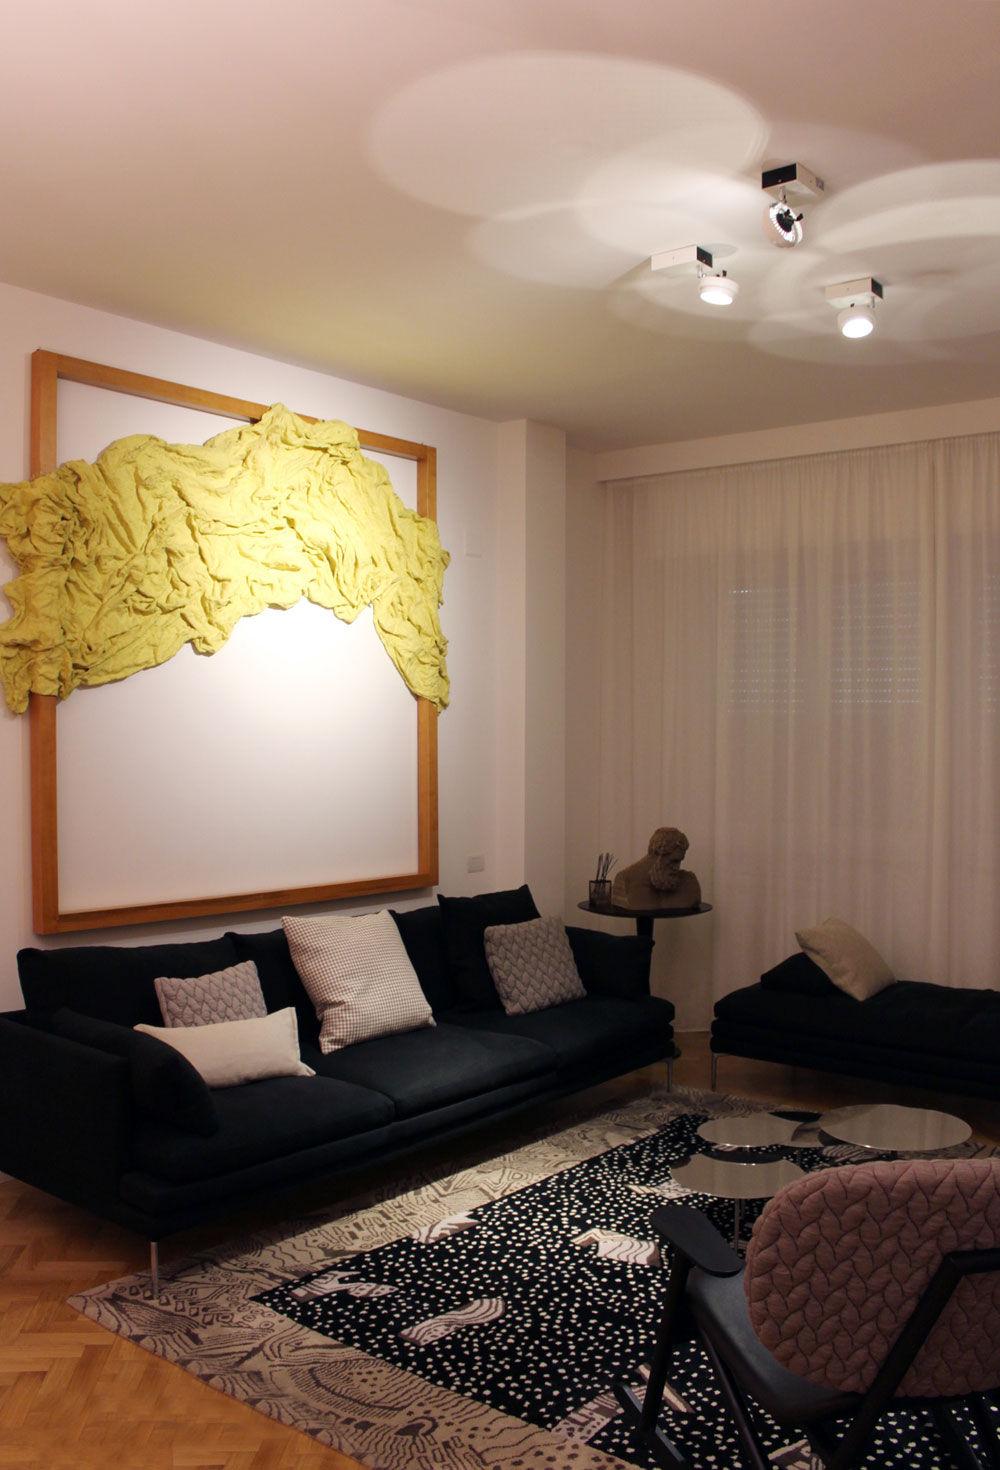 Casa BM modern and elegant